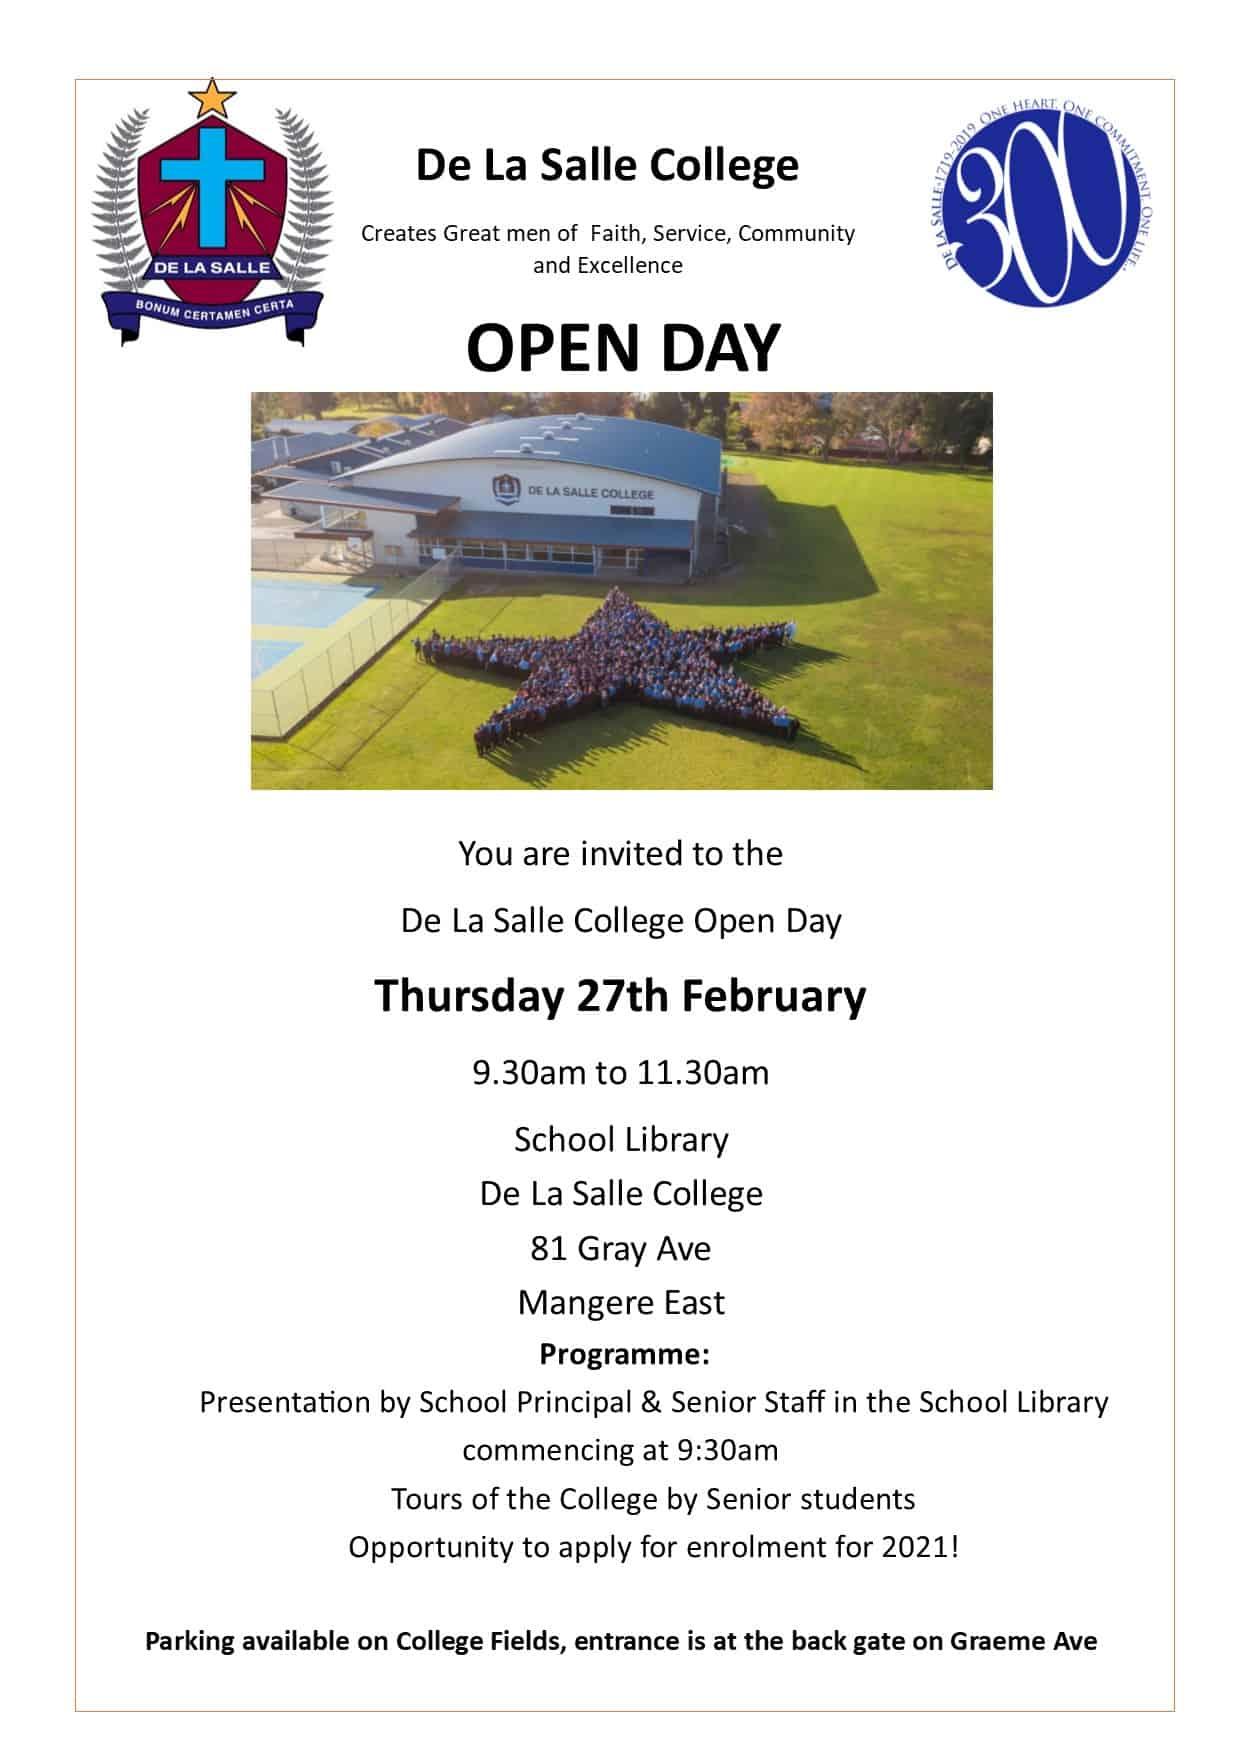 De La Salle College Open Day 2020